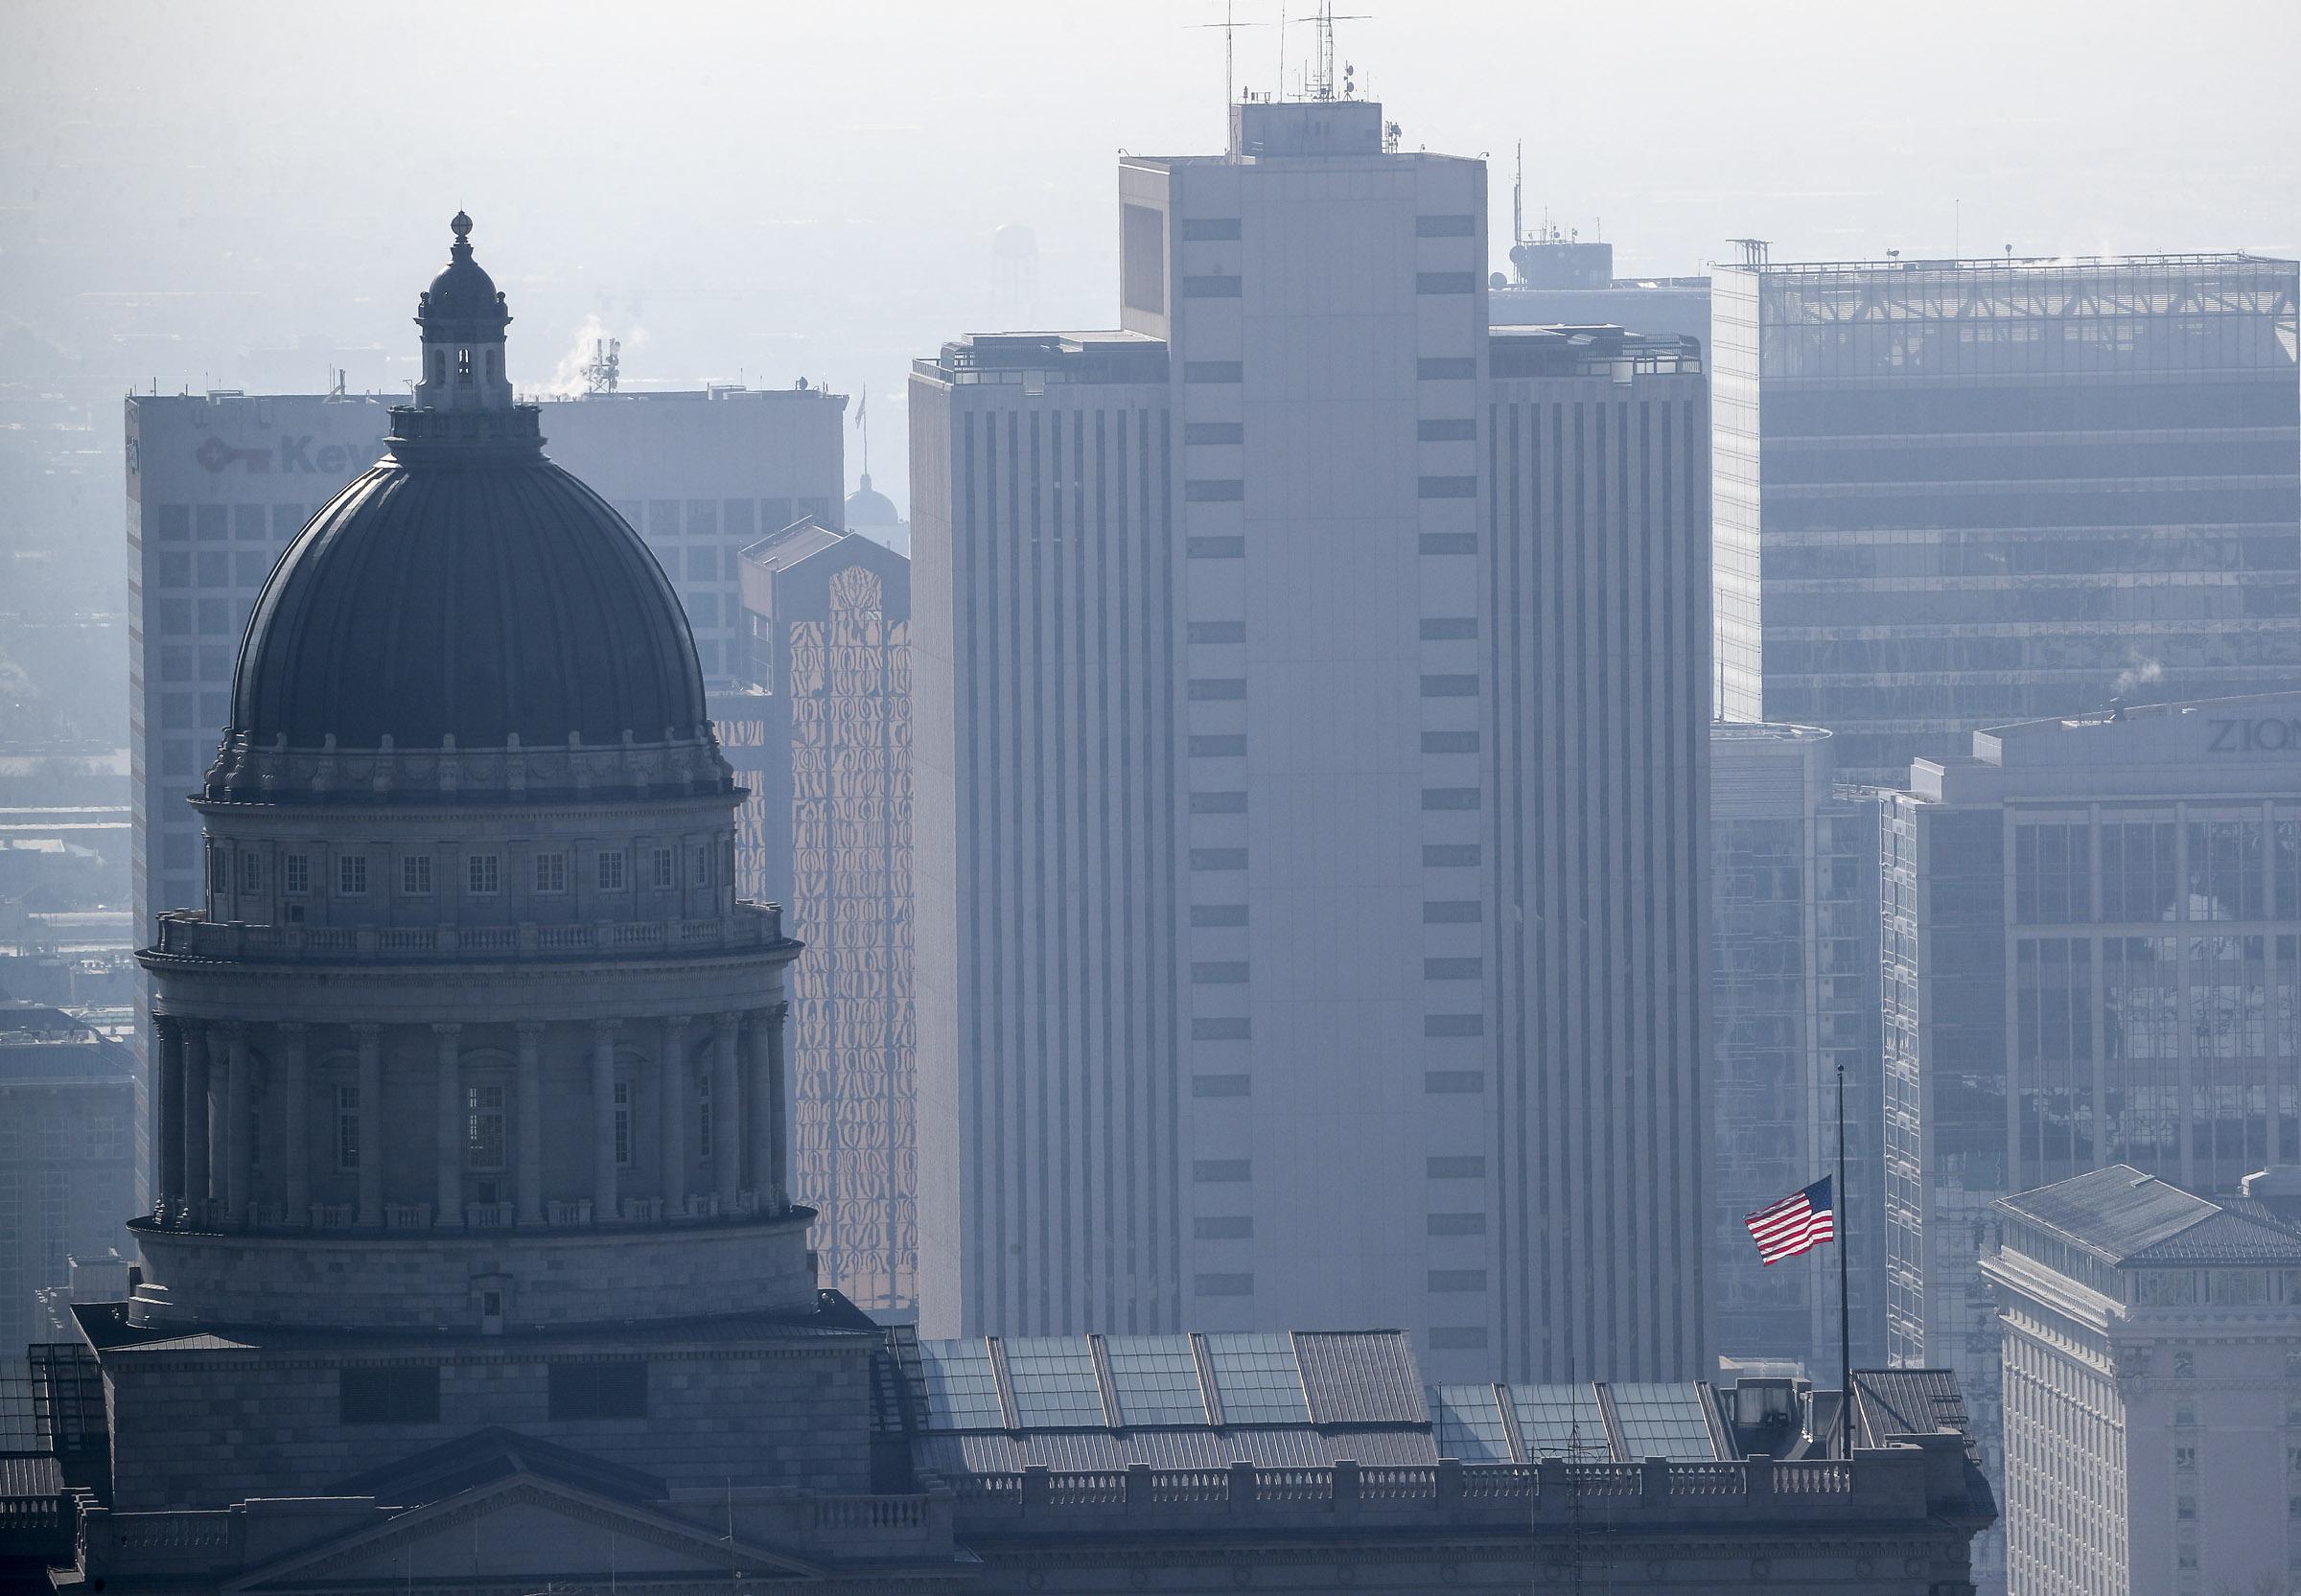 The Utah Capitol and the skyline of Salt Lake City.